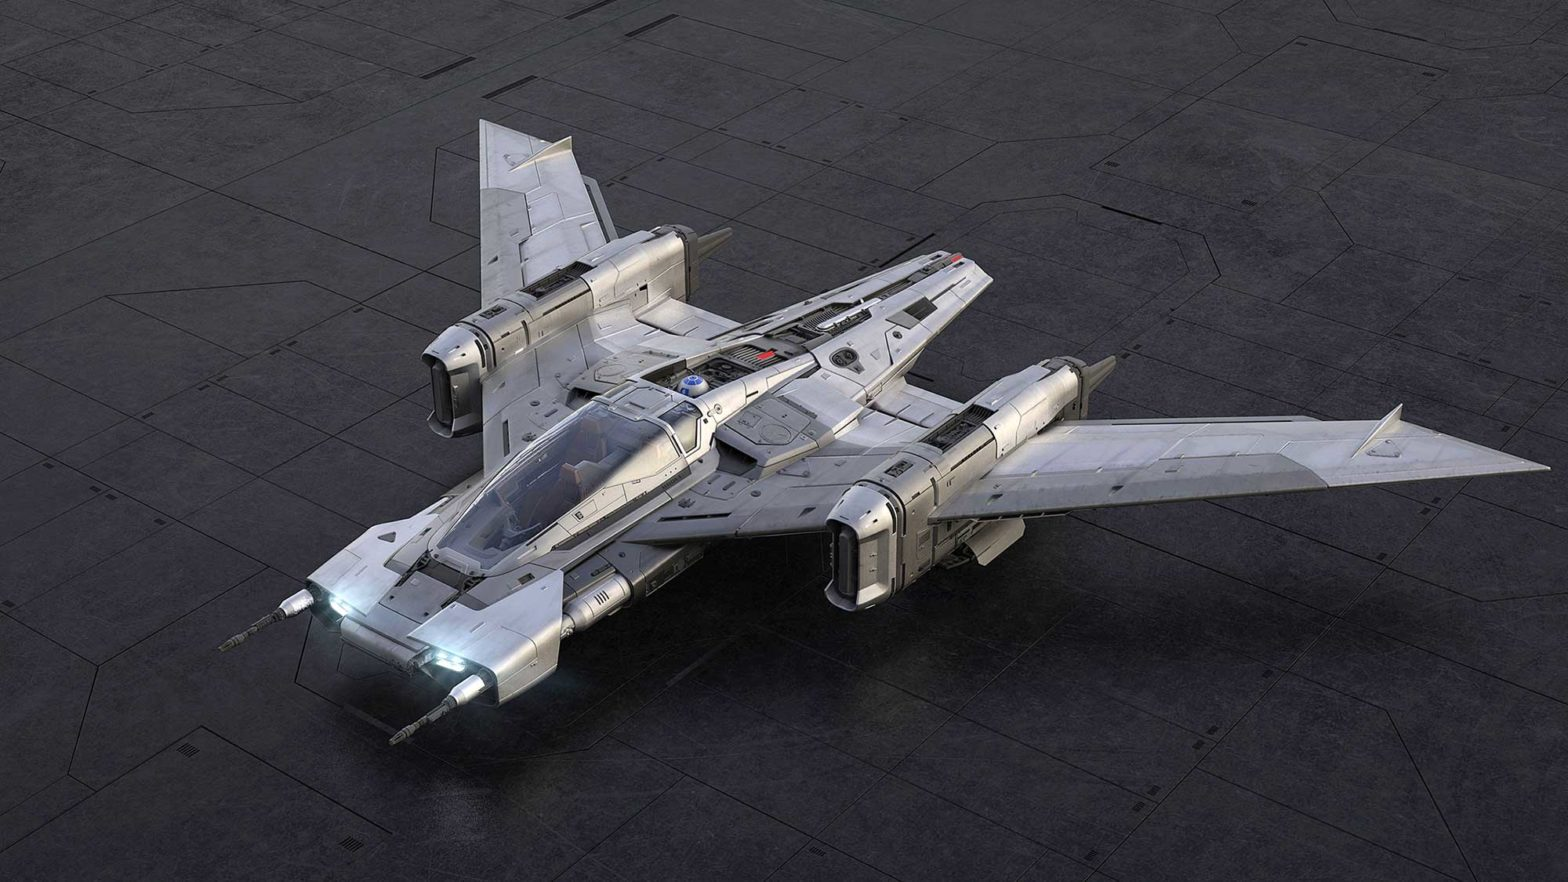 Porsche x Lucasfilm Tri-Wing S-91x Pegasus Starfighter